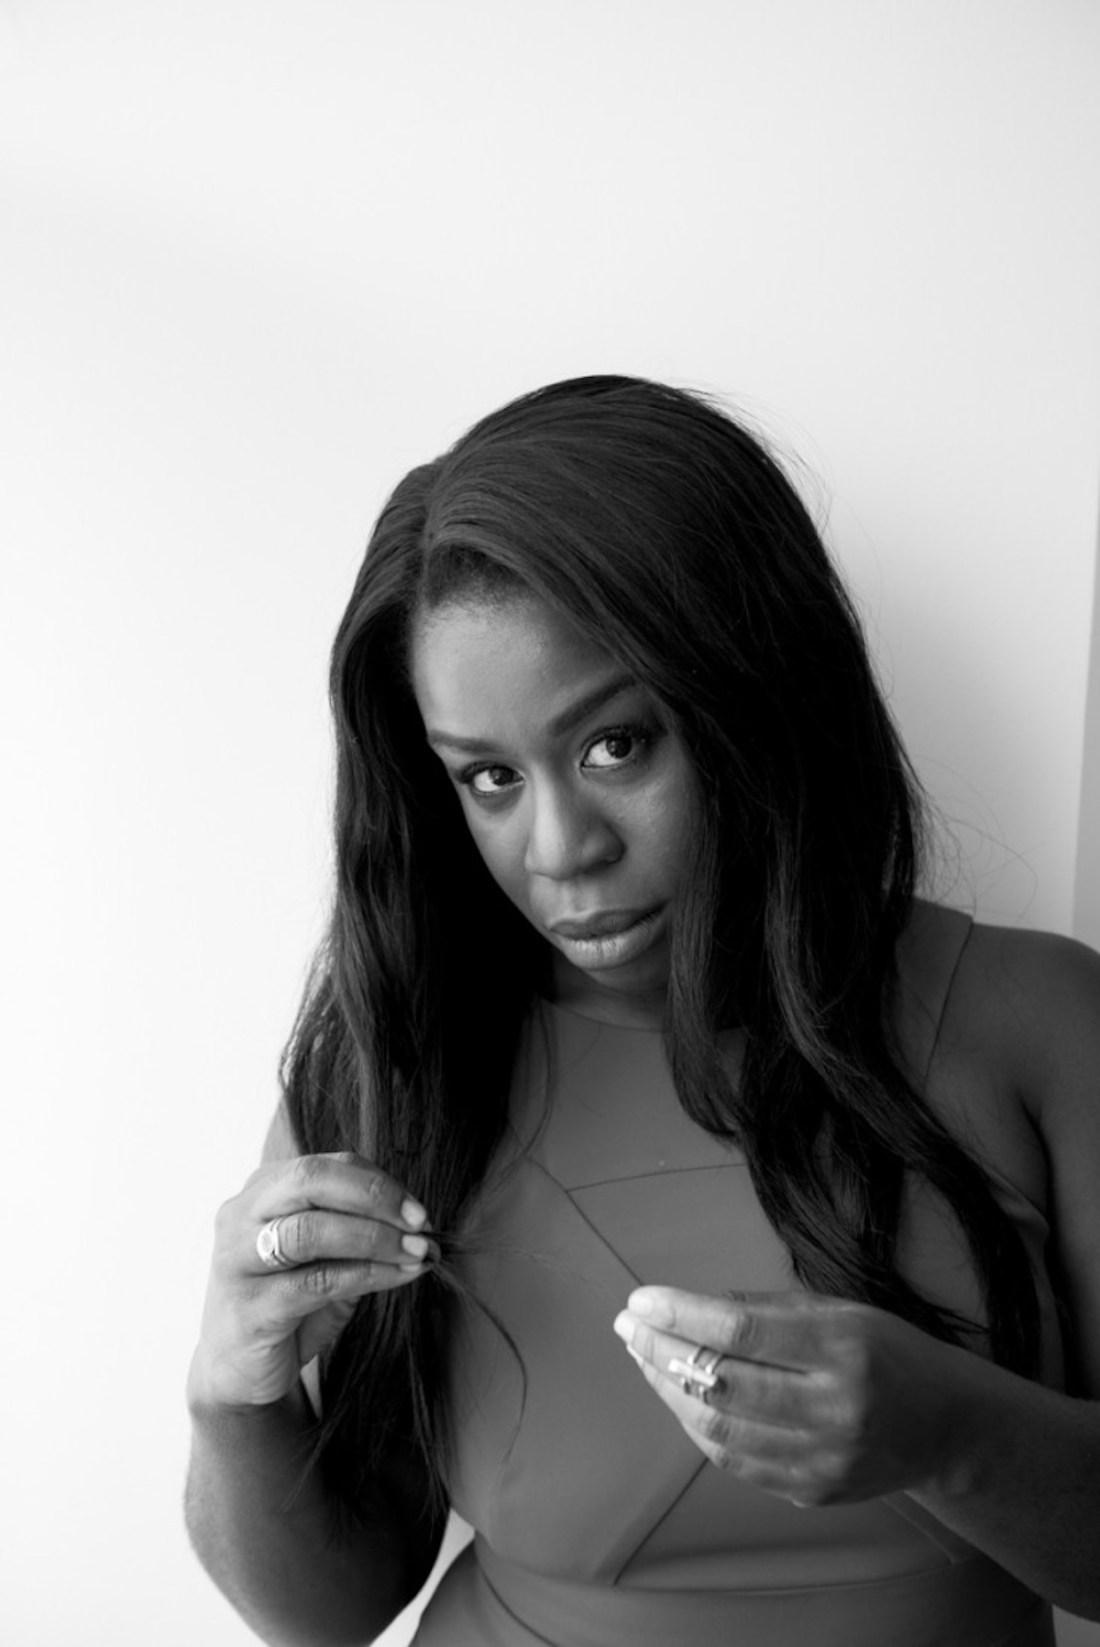 Uzo Aduba, Toni Stone, Basketball, African American Athlete, Black Athlete, African American Actress, Black Actress, African American Theater, Black Theater, KOLUMN Magazine, KOLUMN, KINDR'D Magazine, KINDR'D